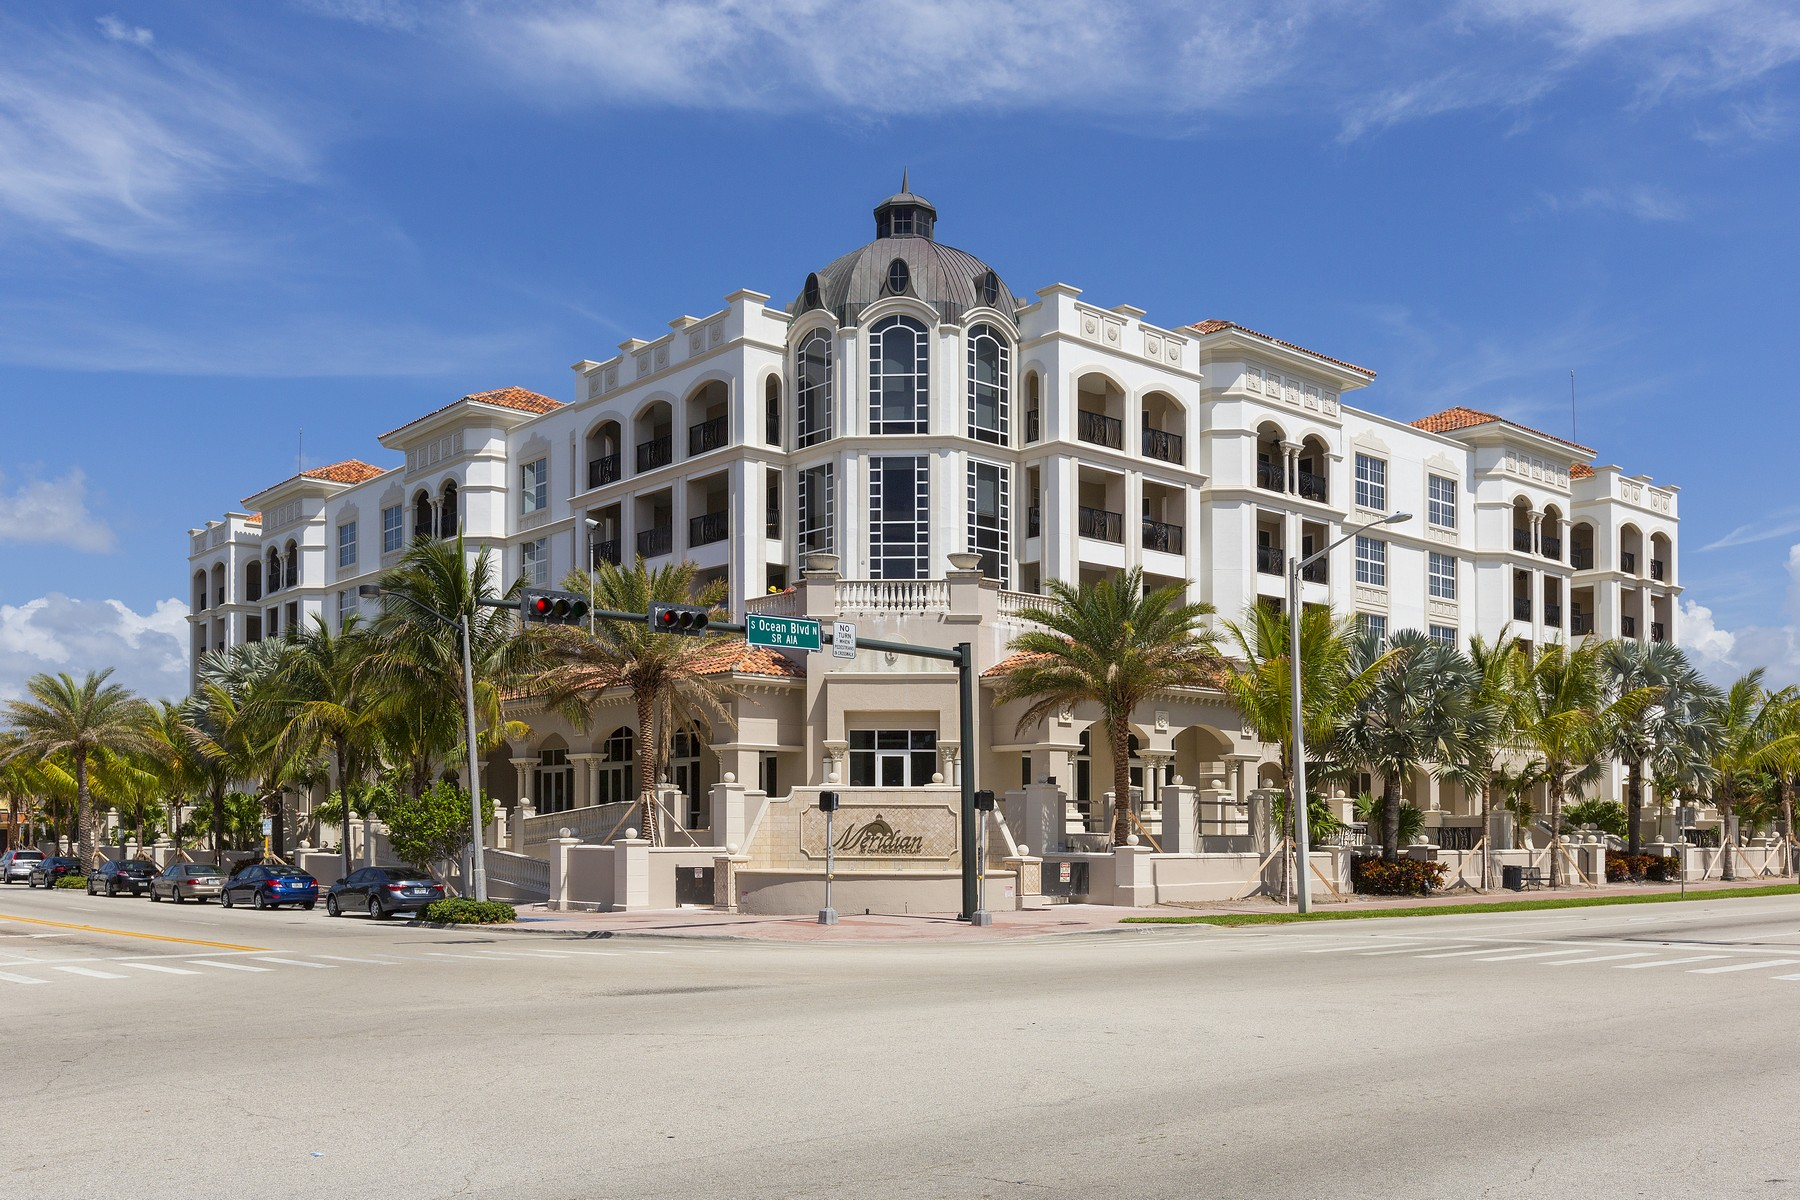 Property For Sale at 1 N Ocean Blvd , 206, Boca Raton, FL 33432